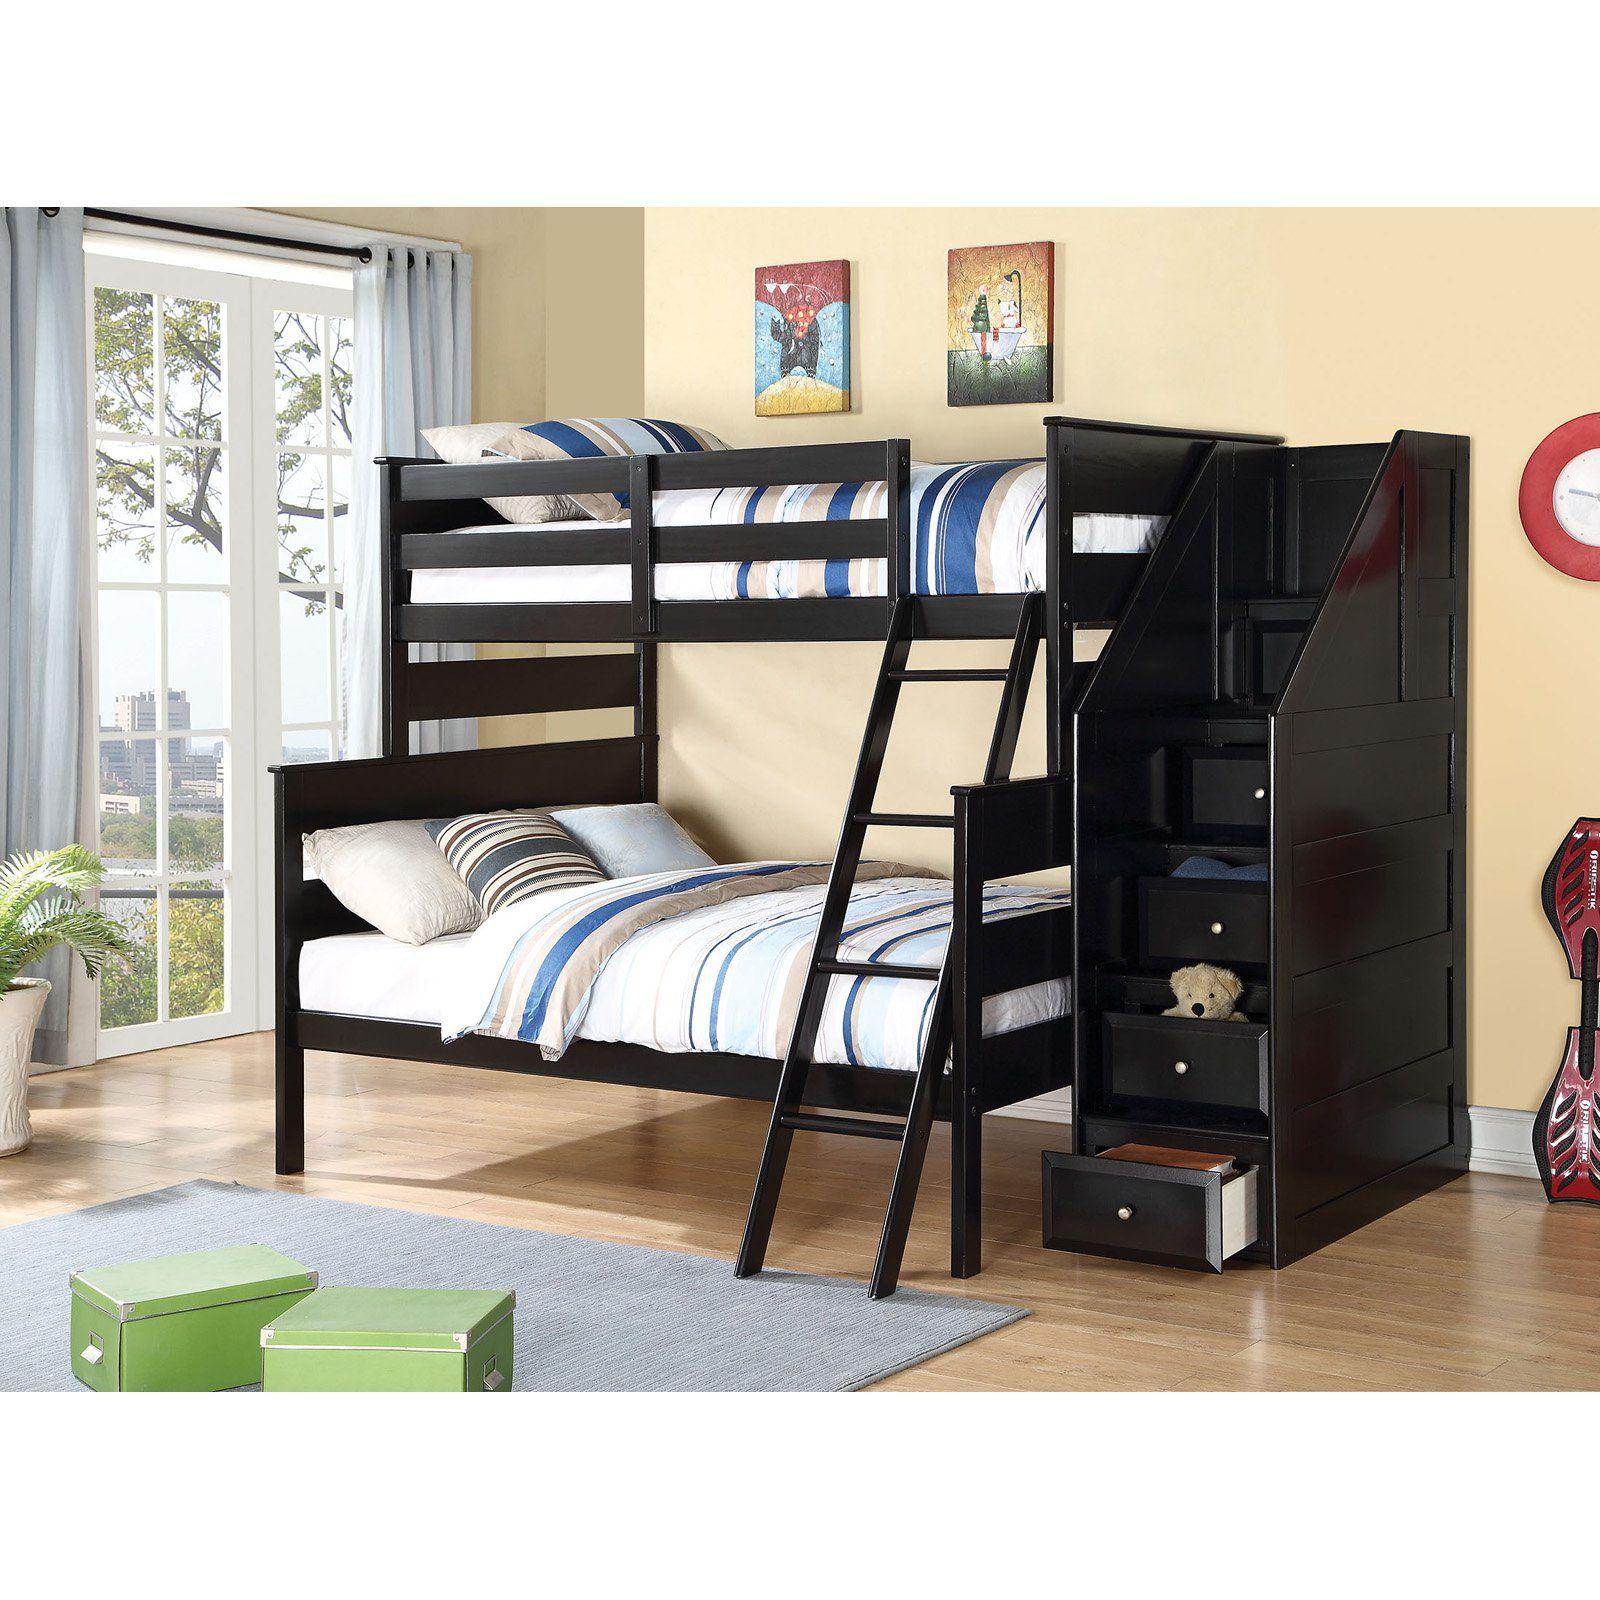 Acme Furniture Alvis Twin Over Full Bunk Bed Black Full Bunk